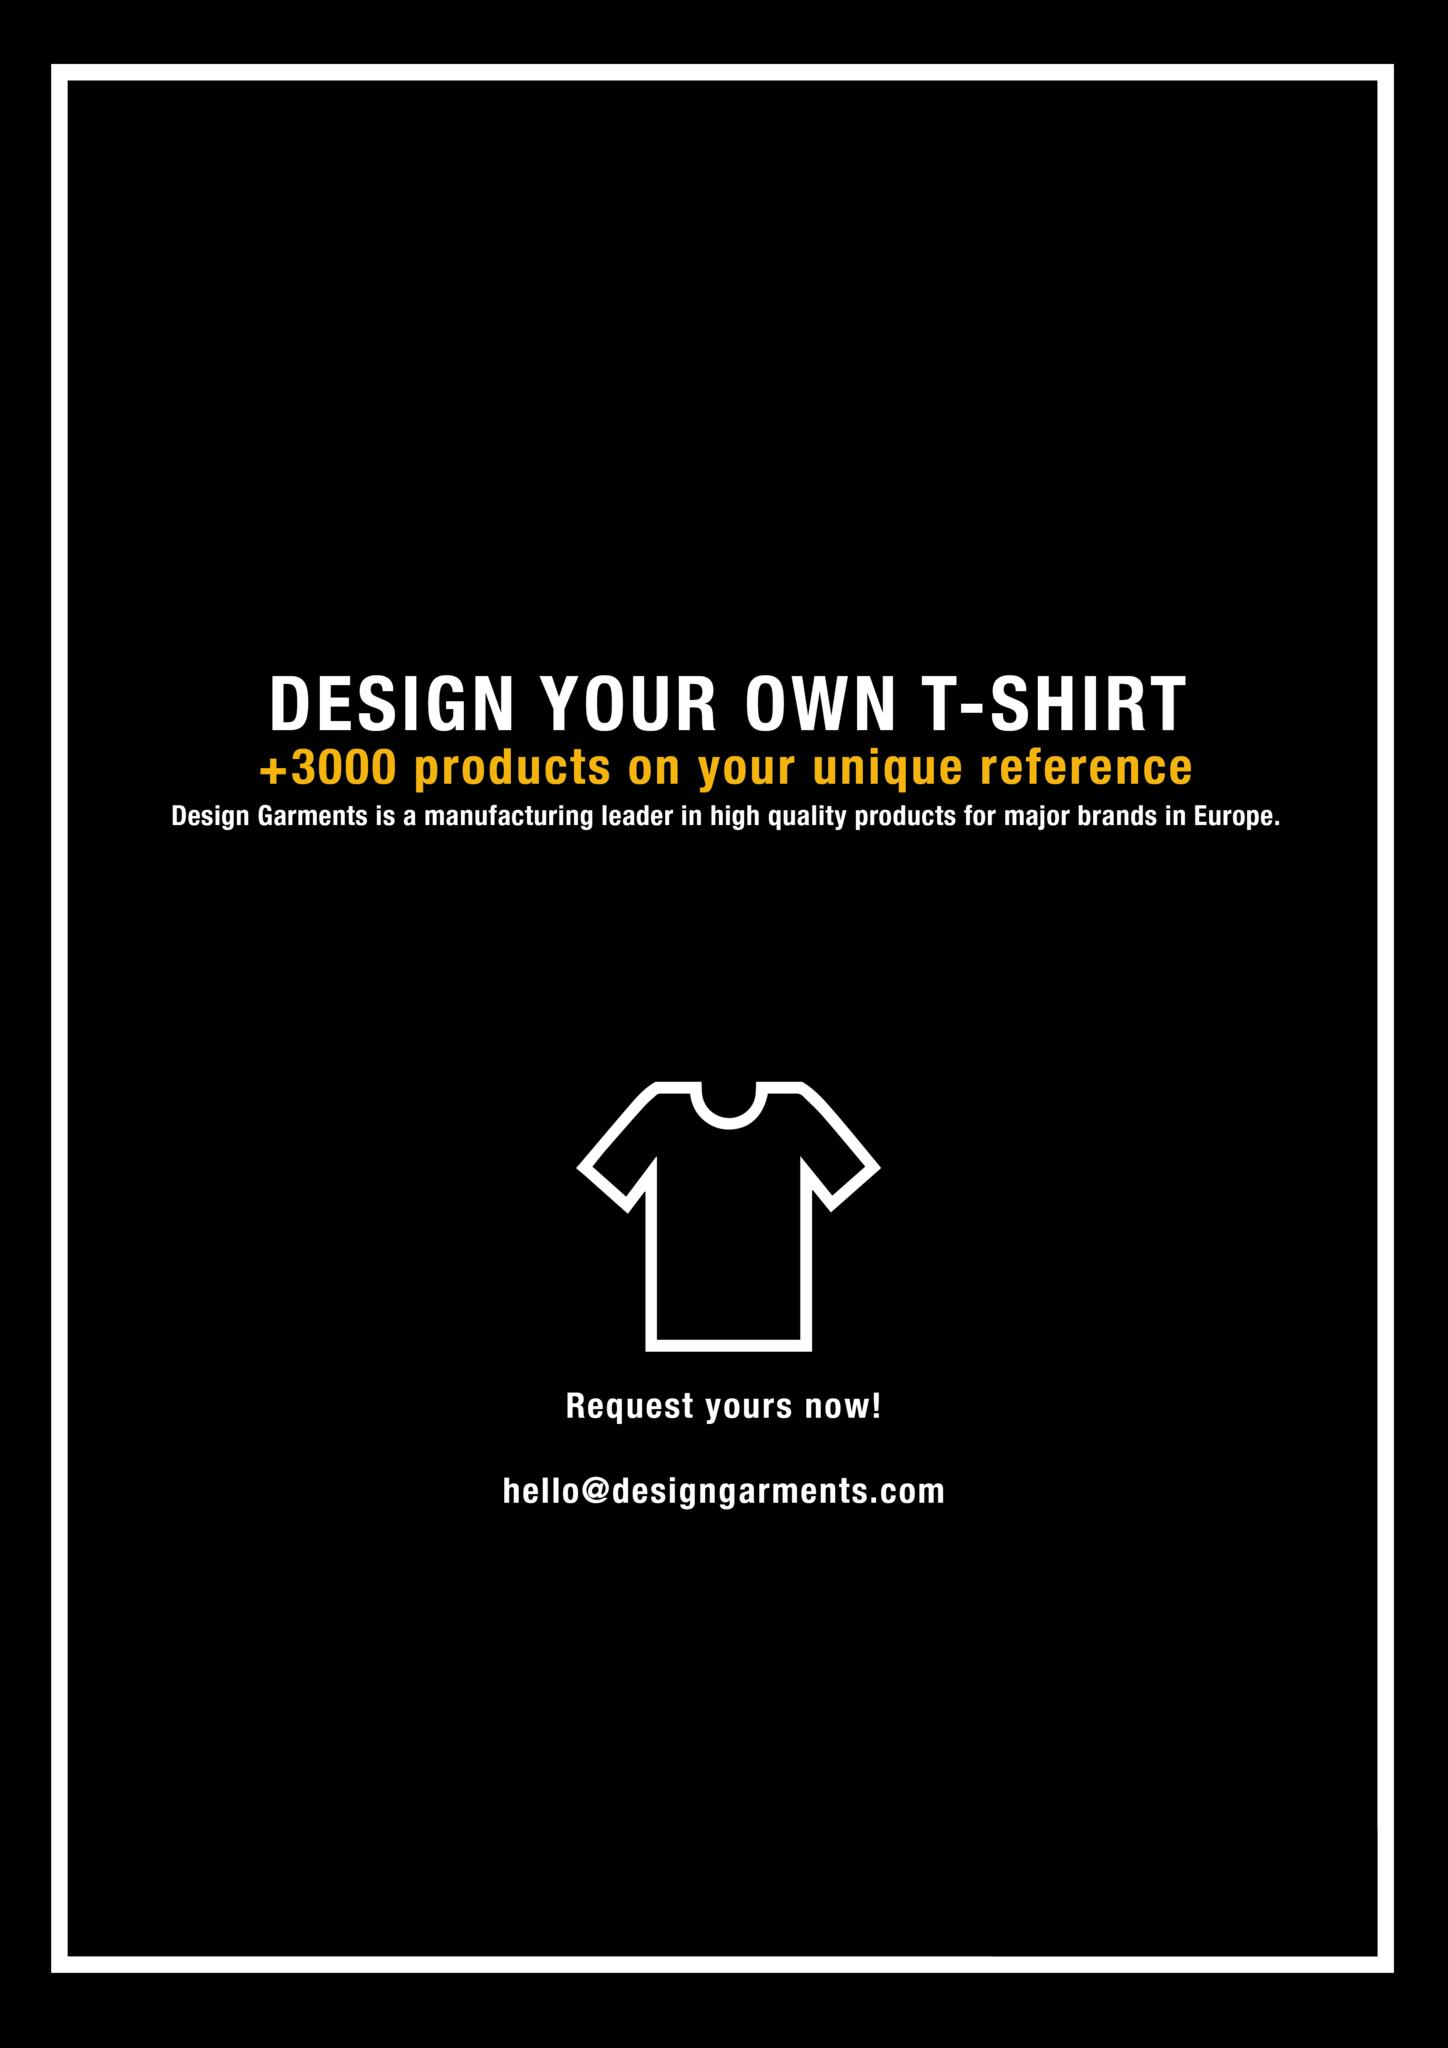 Design your own t shirt picklestore original design t for Design your own t shirt at home